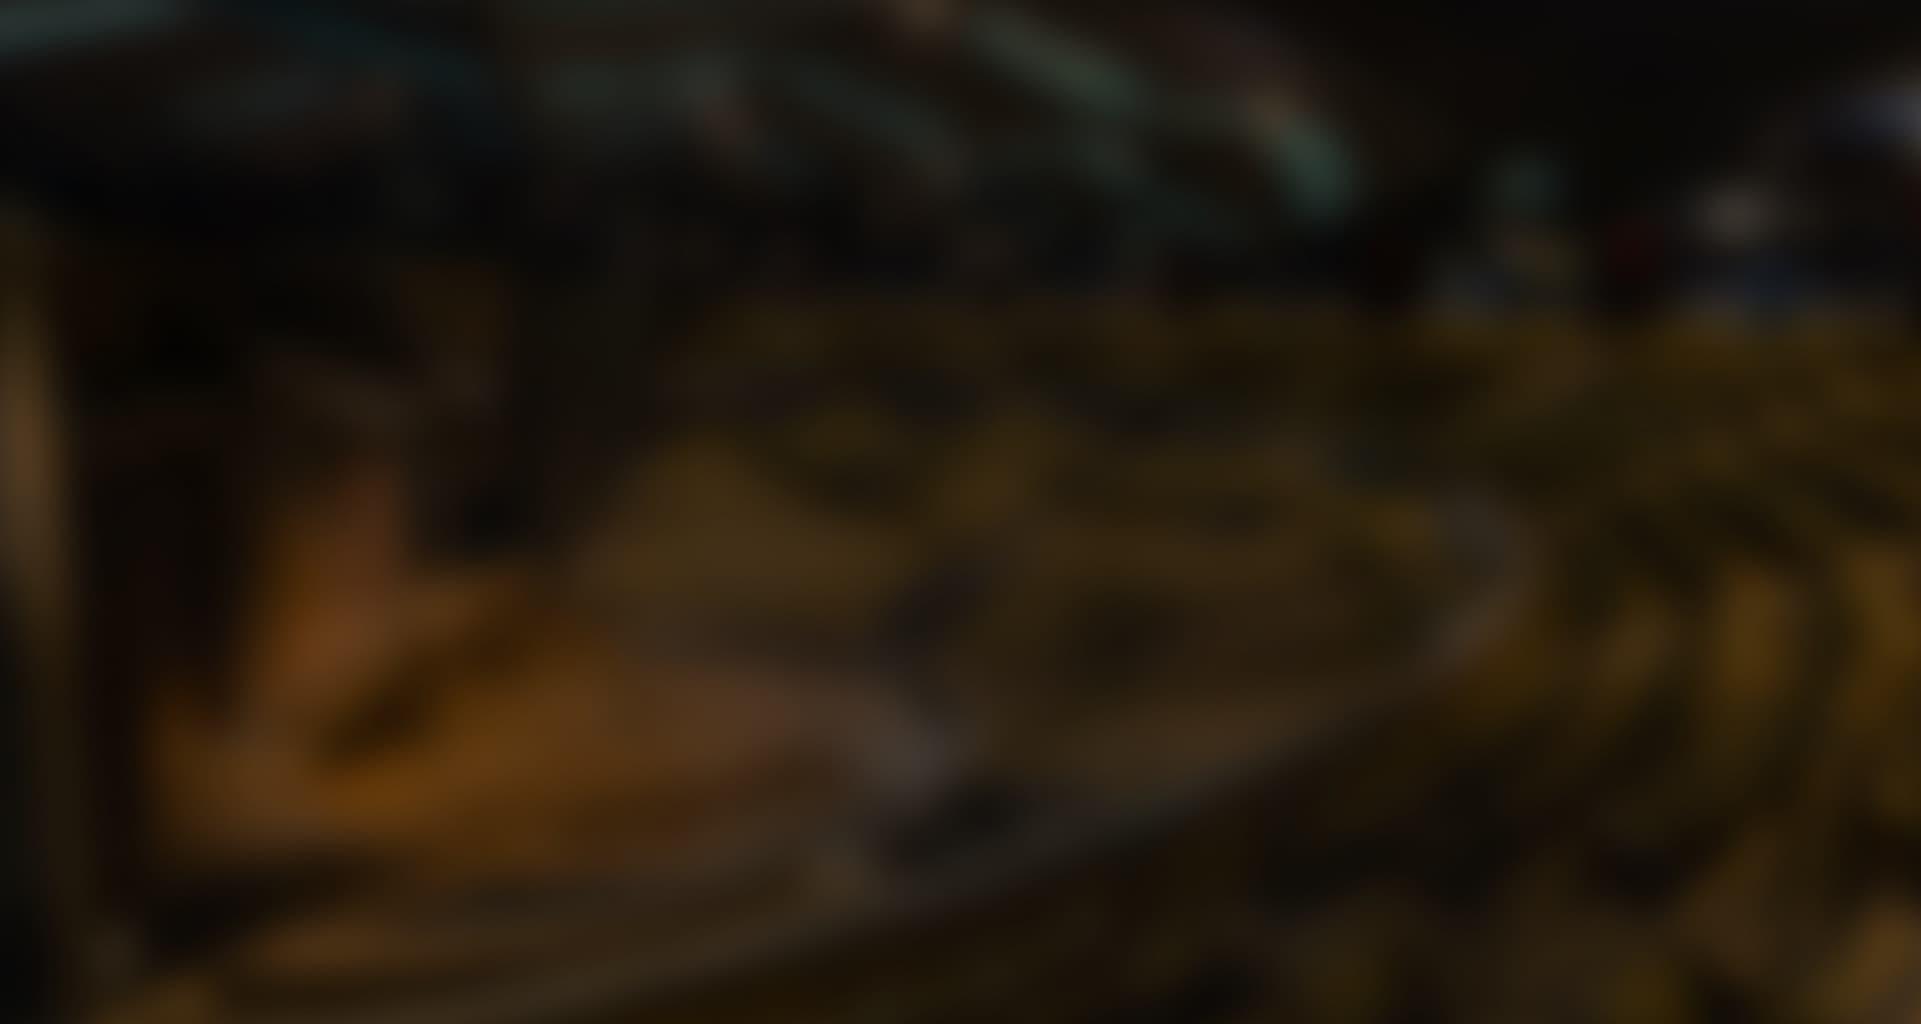 background image for Stratford Festival